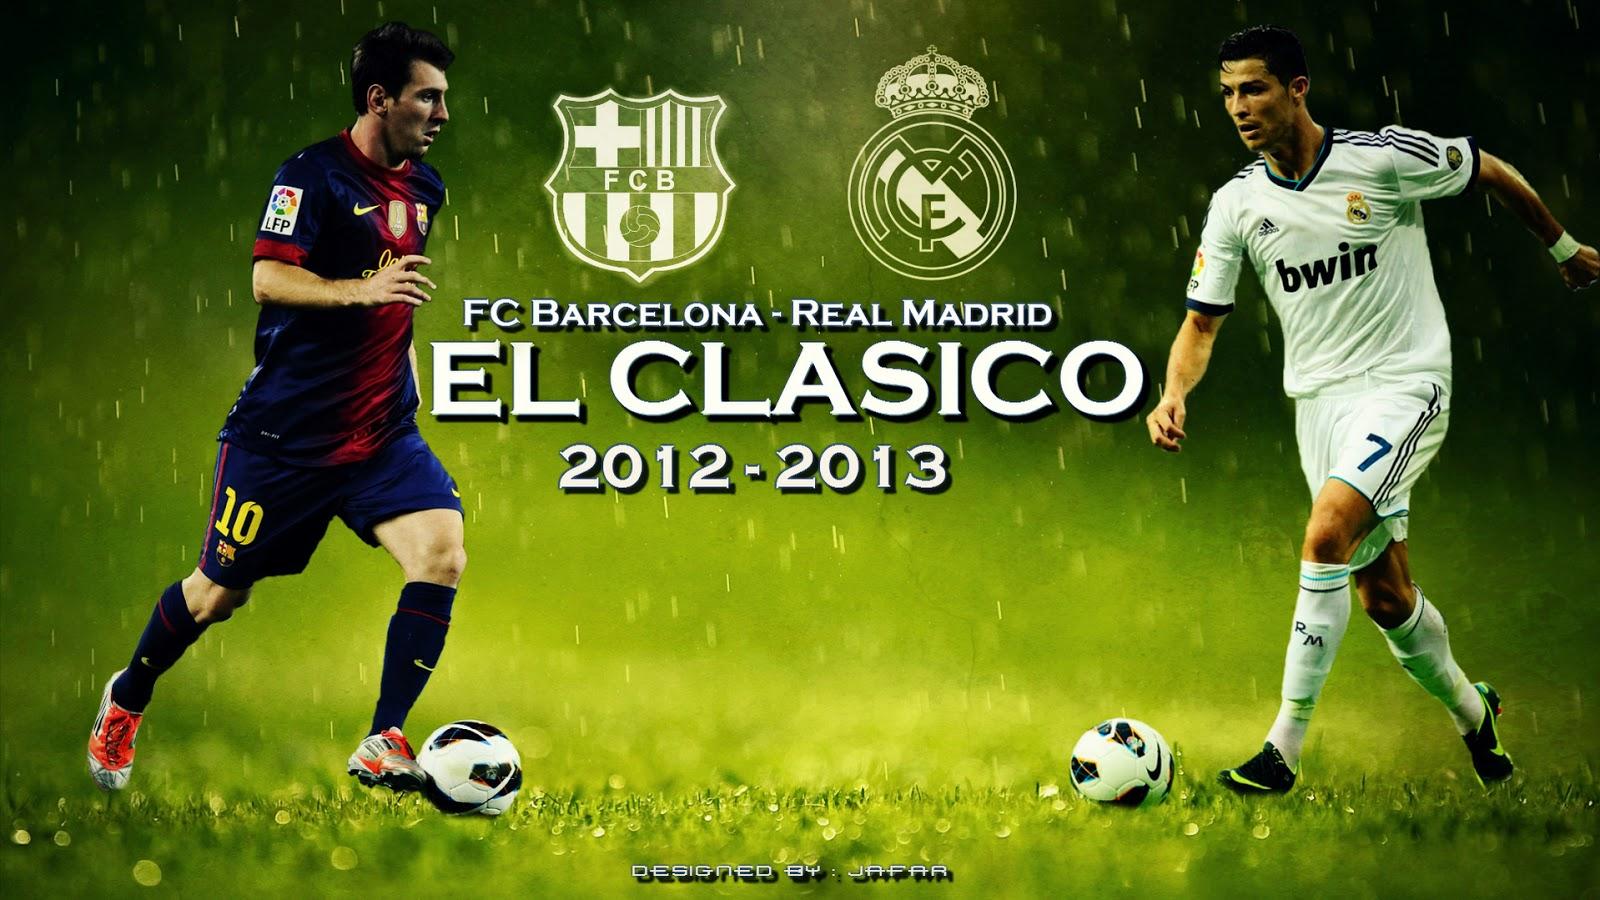 Barcelona Wallpaper 2013 - El Clasico Football Match , HD Wallpaper & Backgrounds